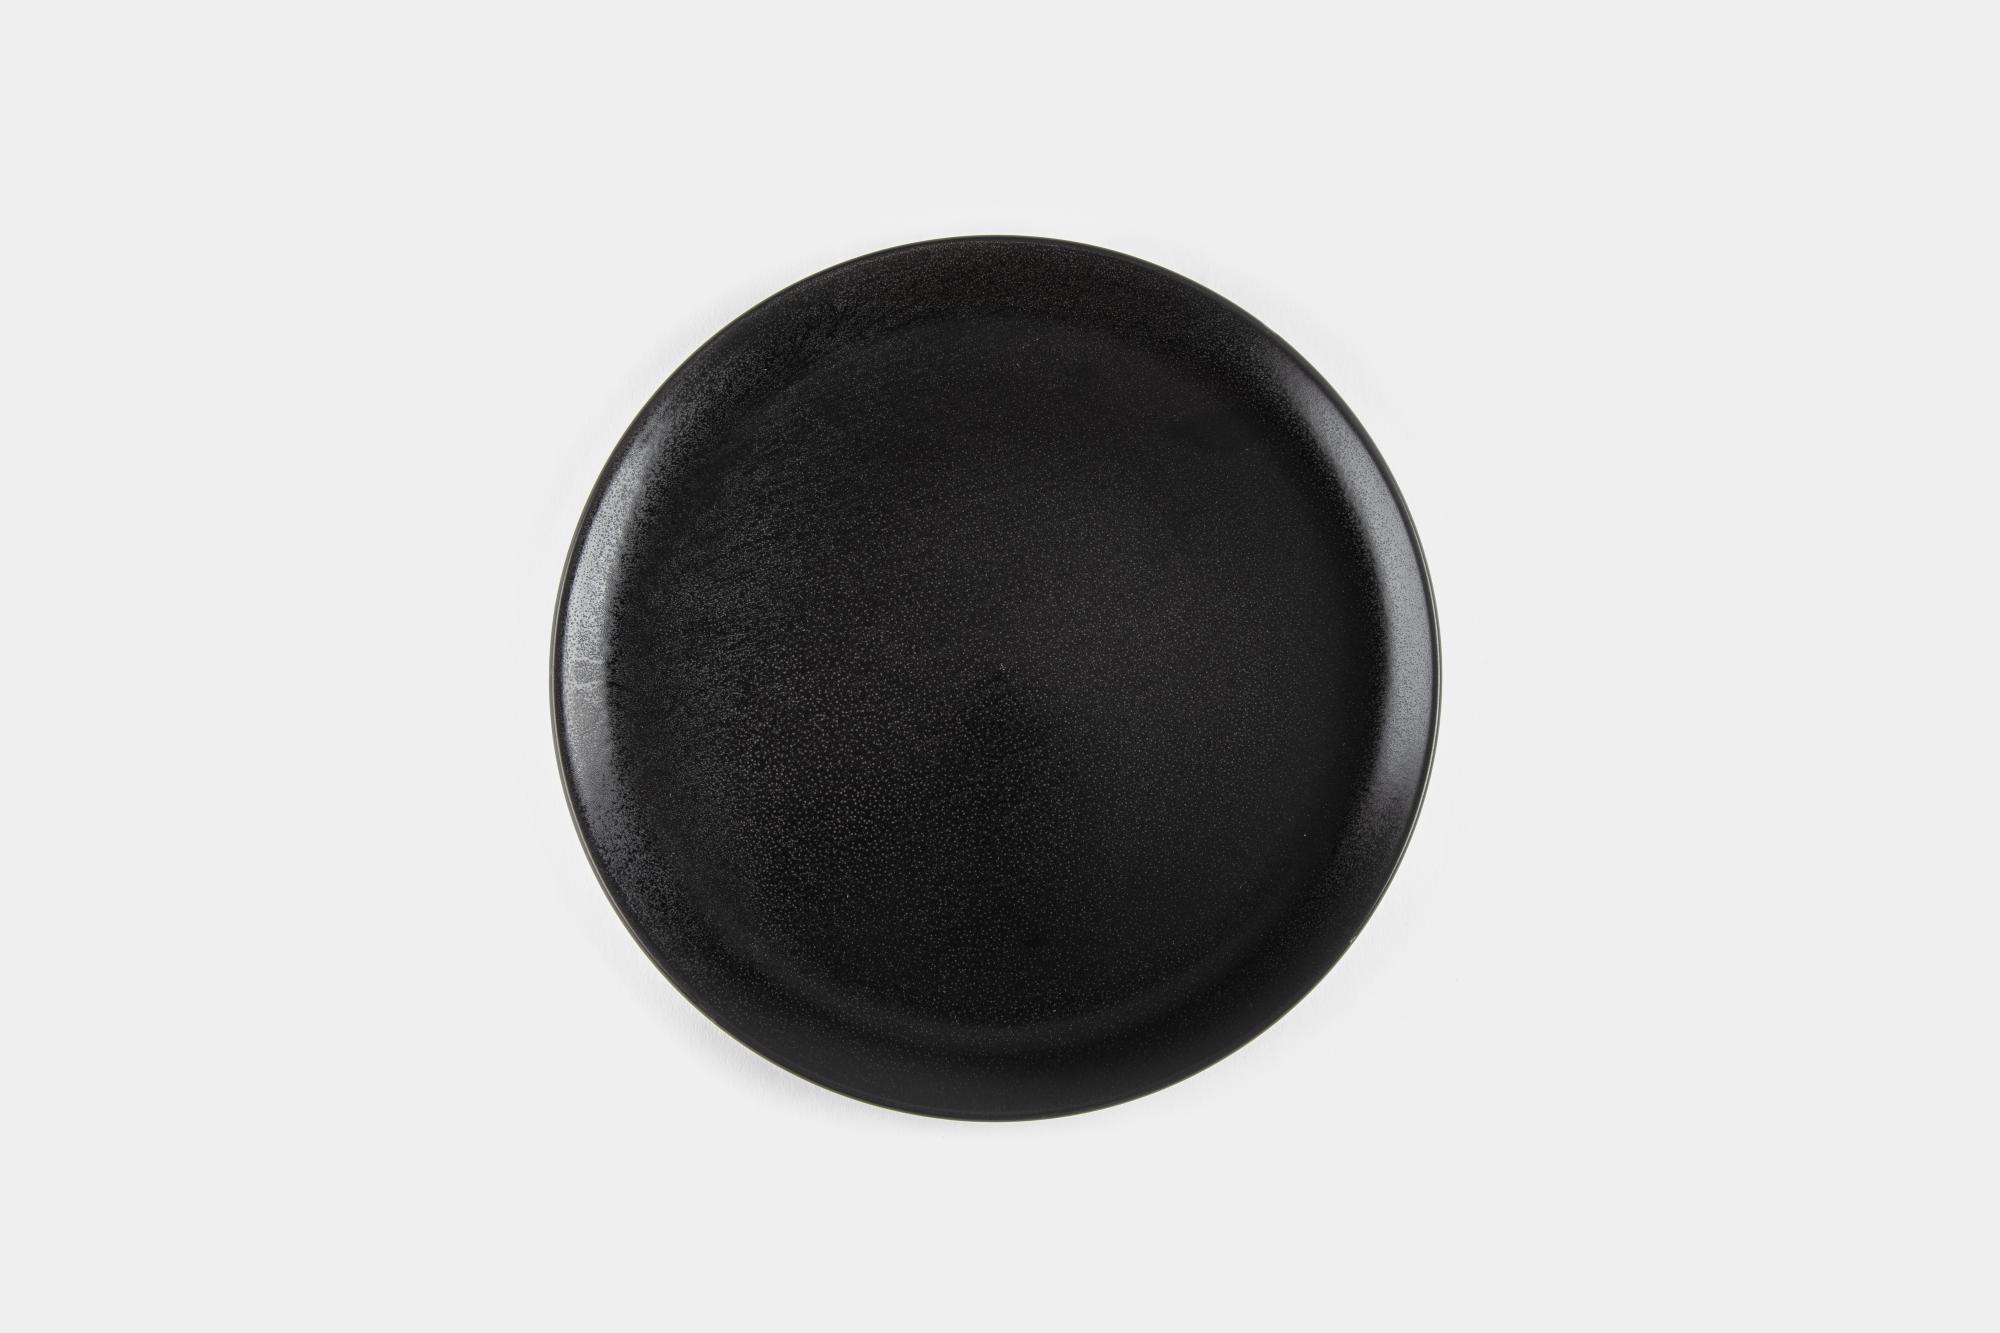 Black plate set - Image 2